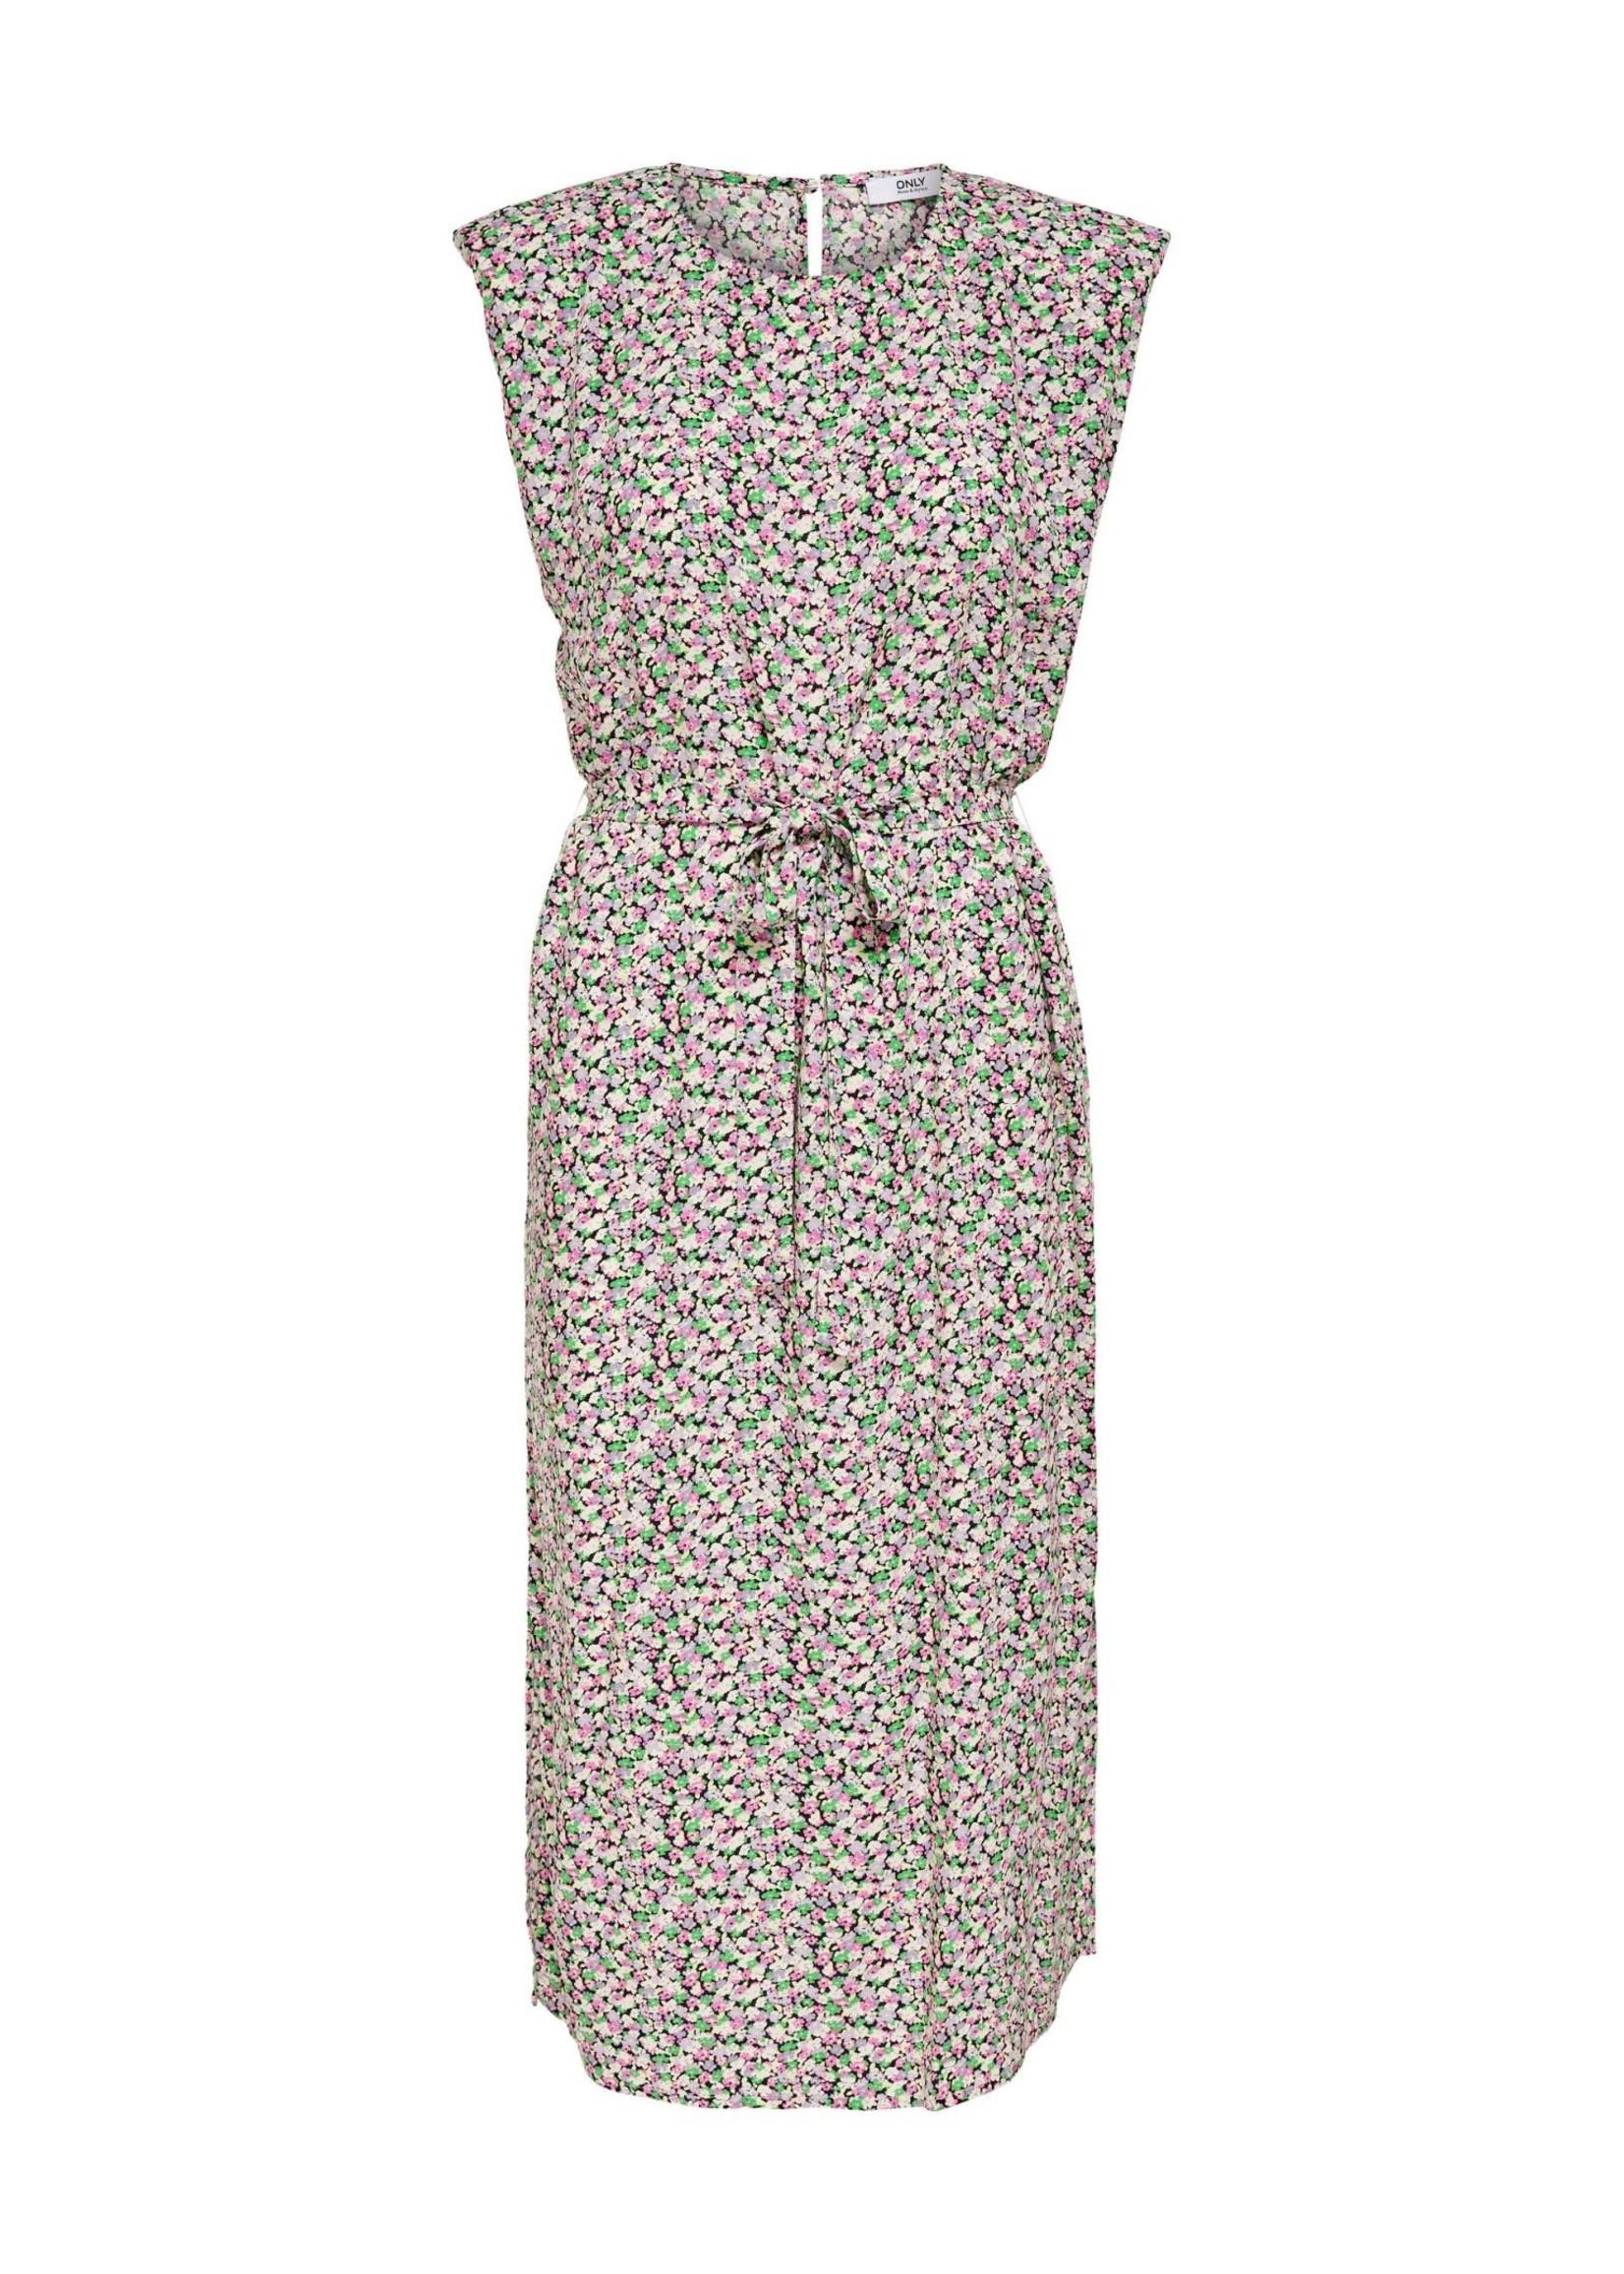 ONLY Laya s/l shoulder pad dress